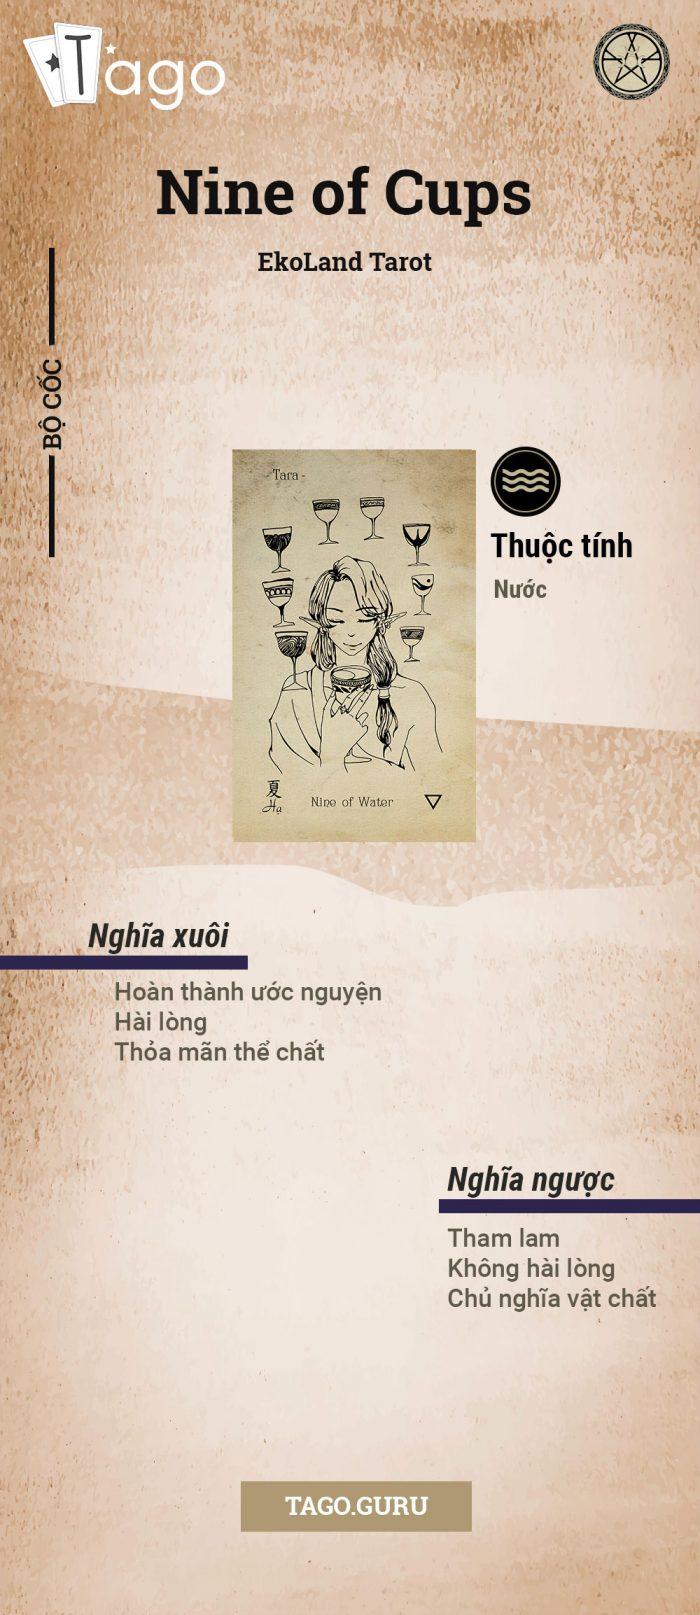 TAGO-Info-Bai-Tarot-Nine-of-cups